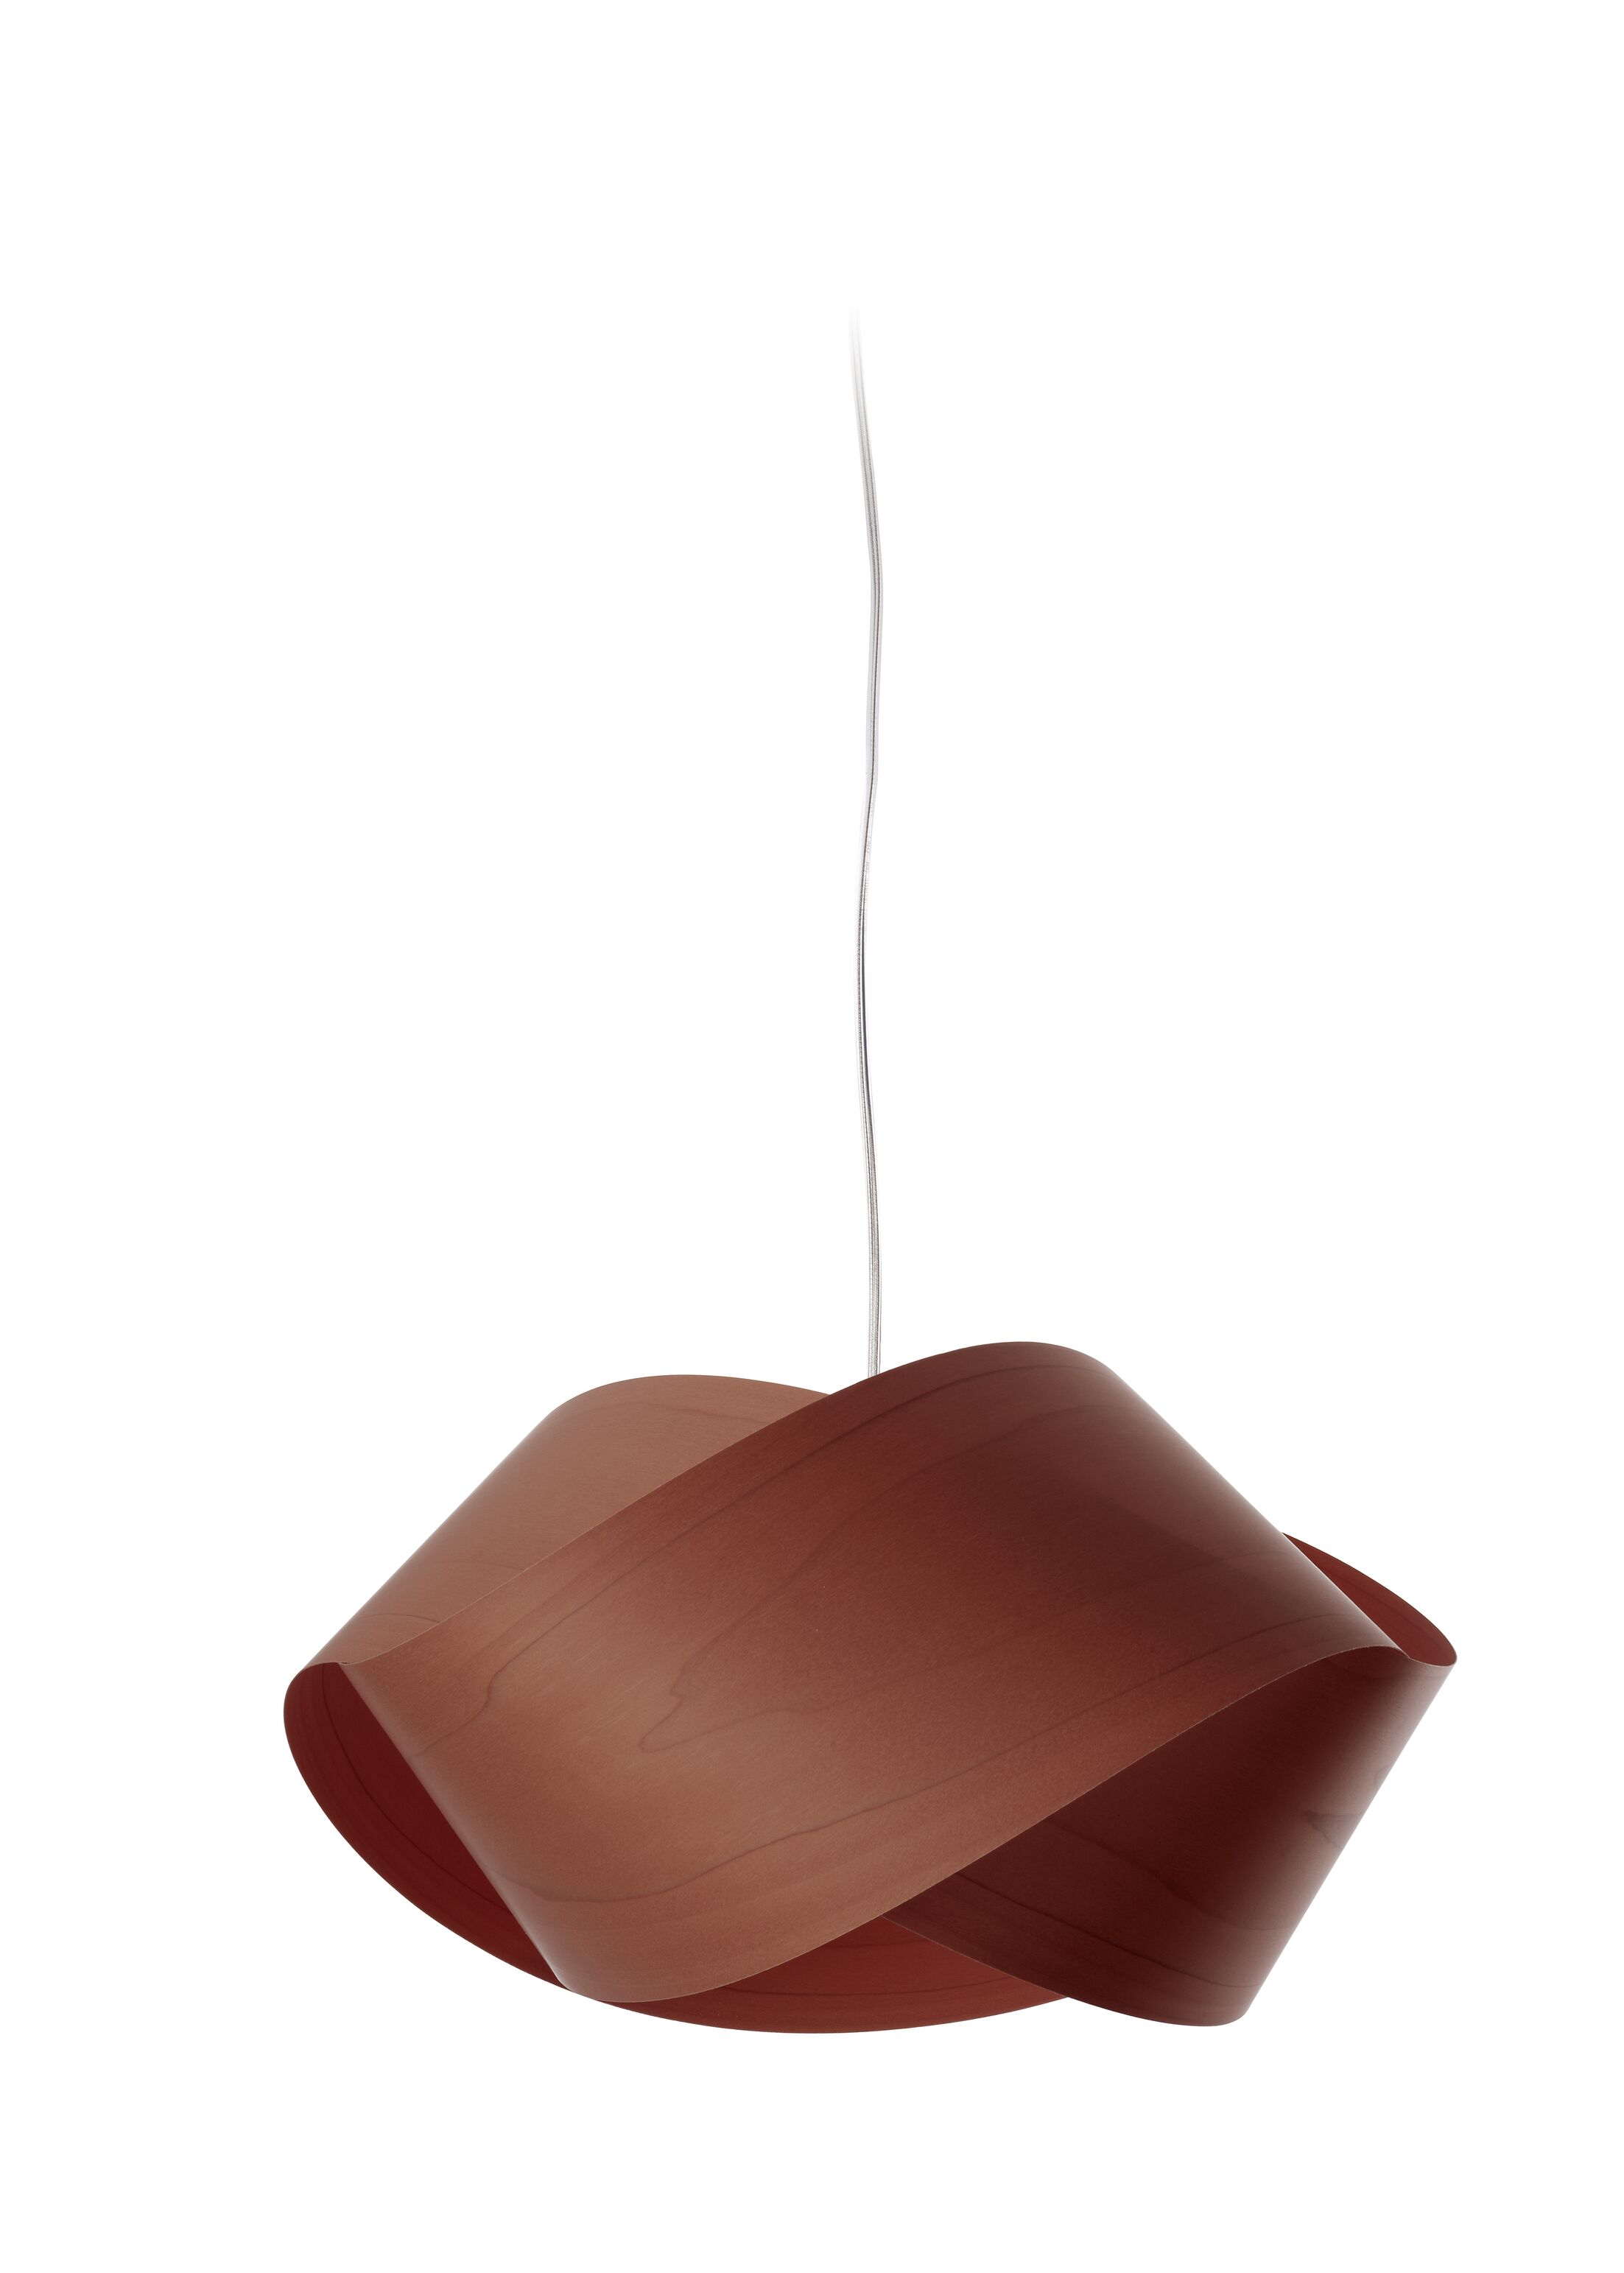 Nut 1-Light Novelty Pendant Shade Color: Chocolate, Bulb Type: GU24